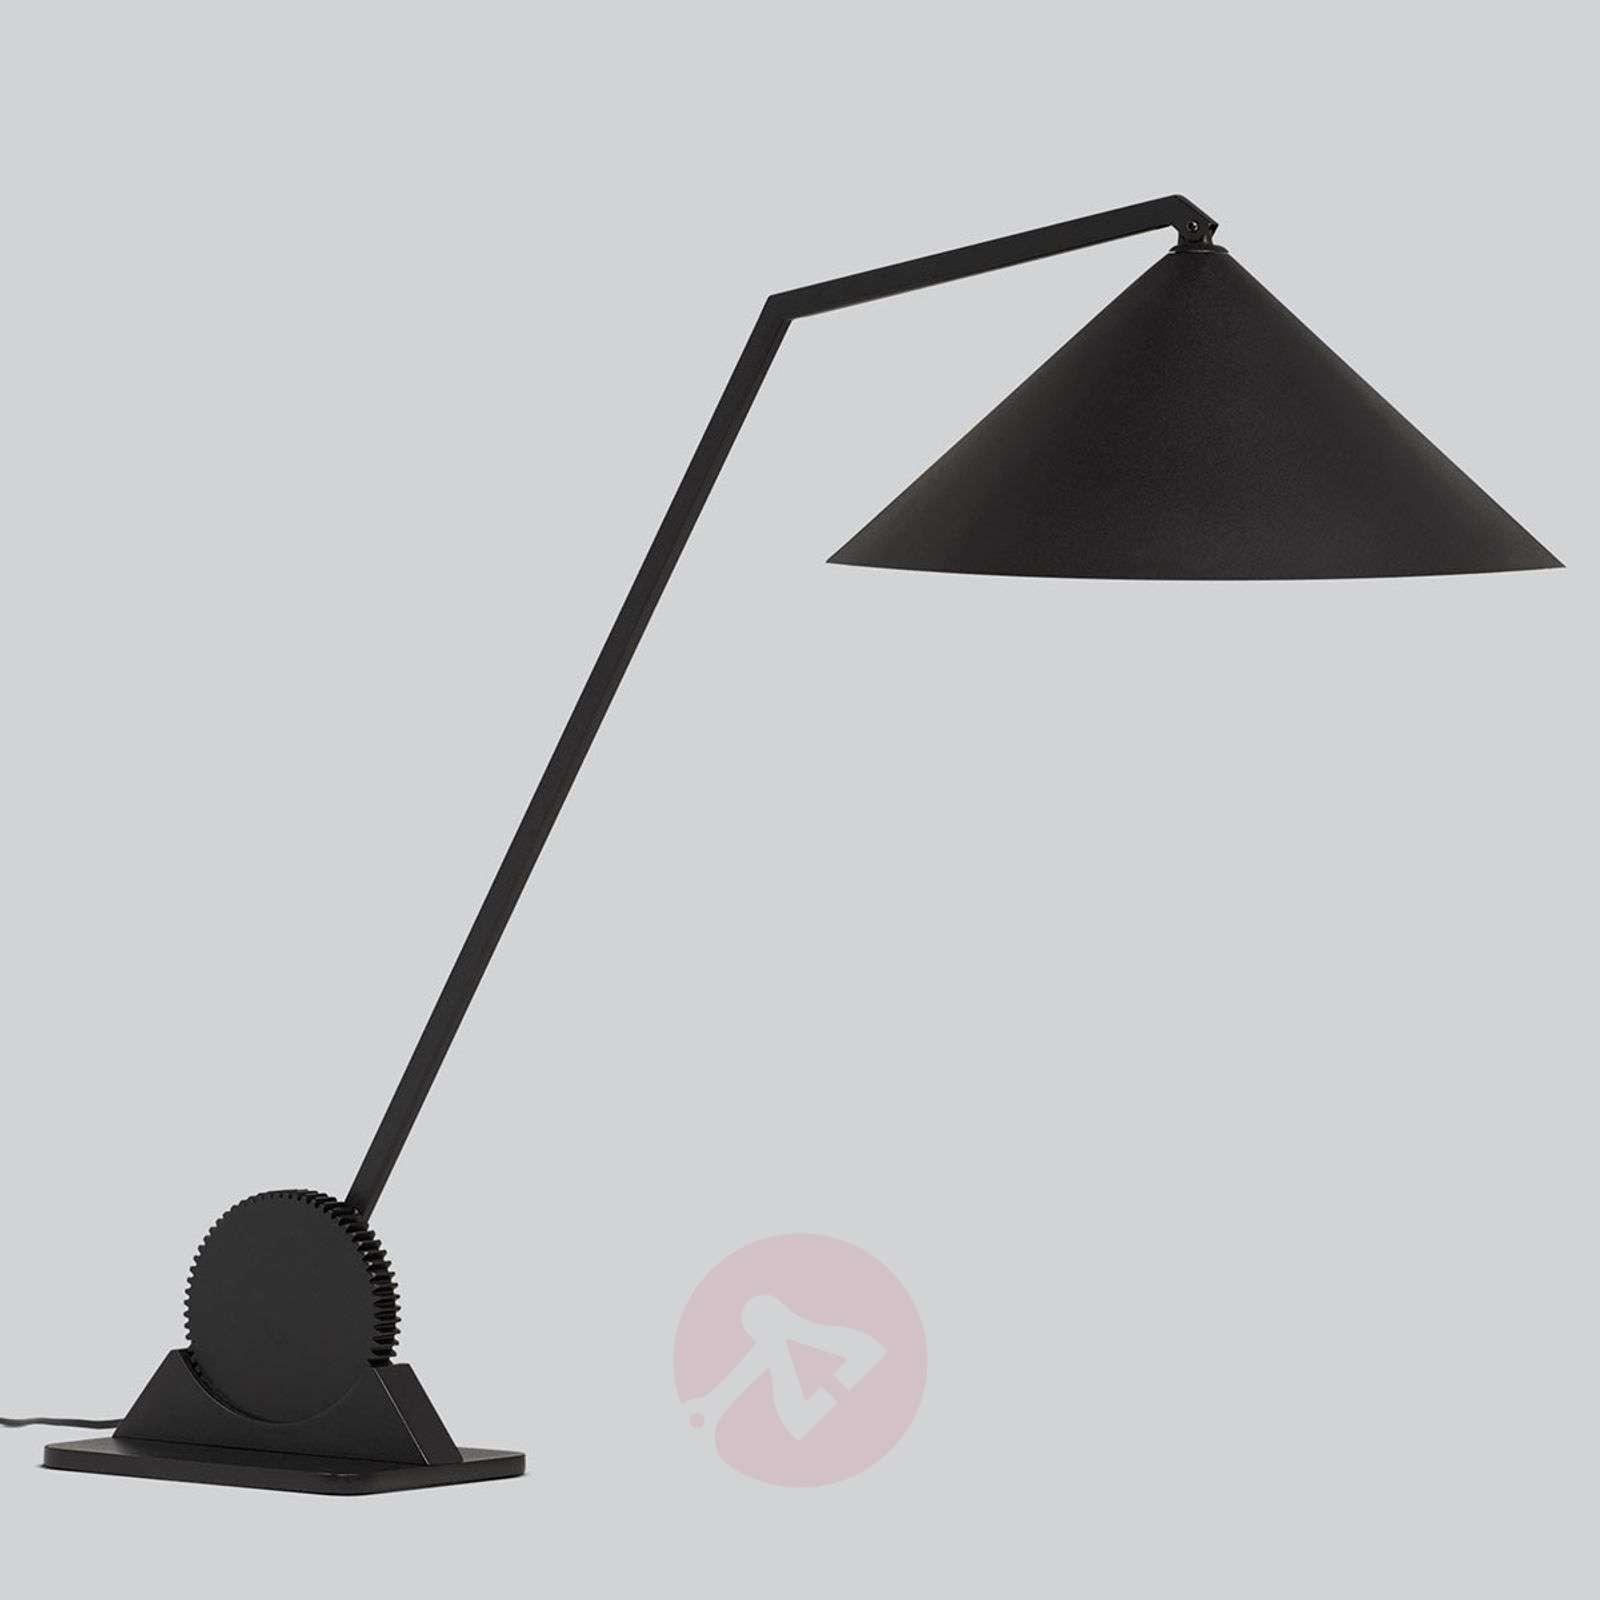 Northern Gear Table industrial pöytälamppu-7013122-01